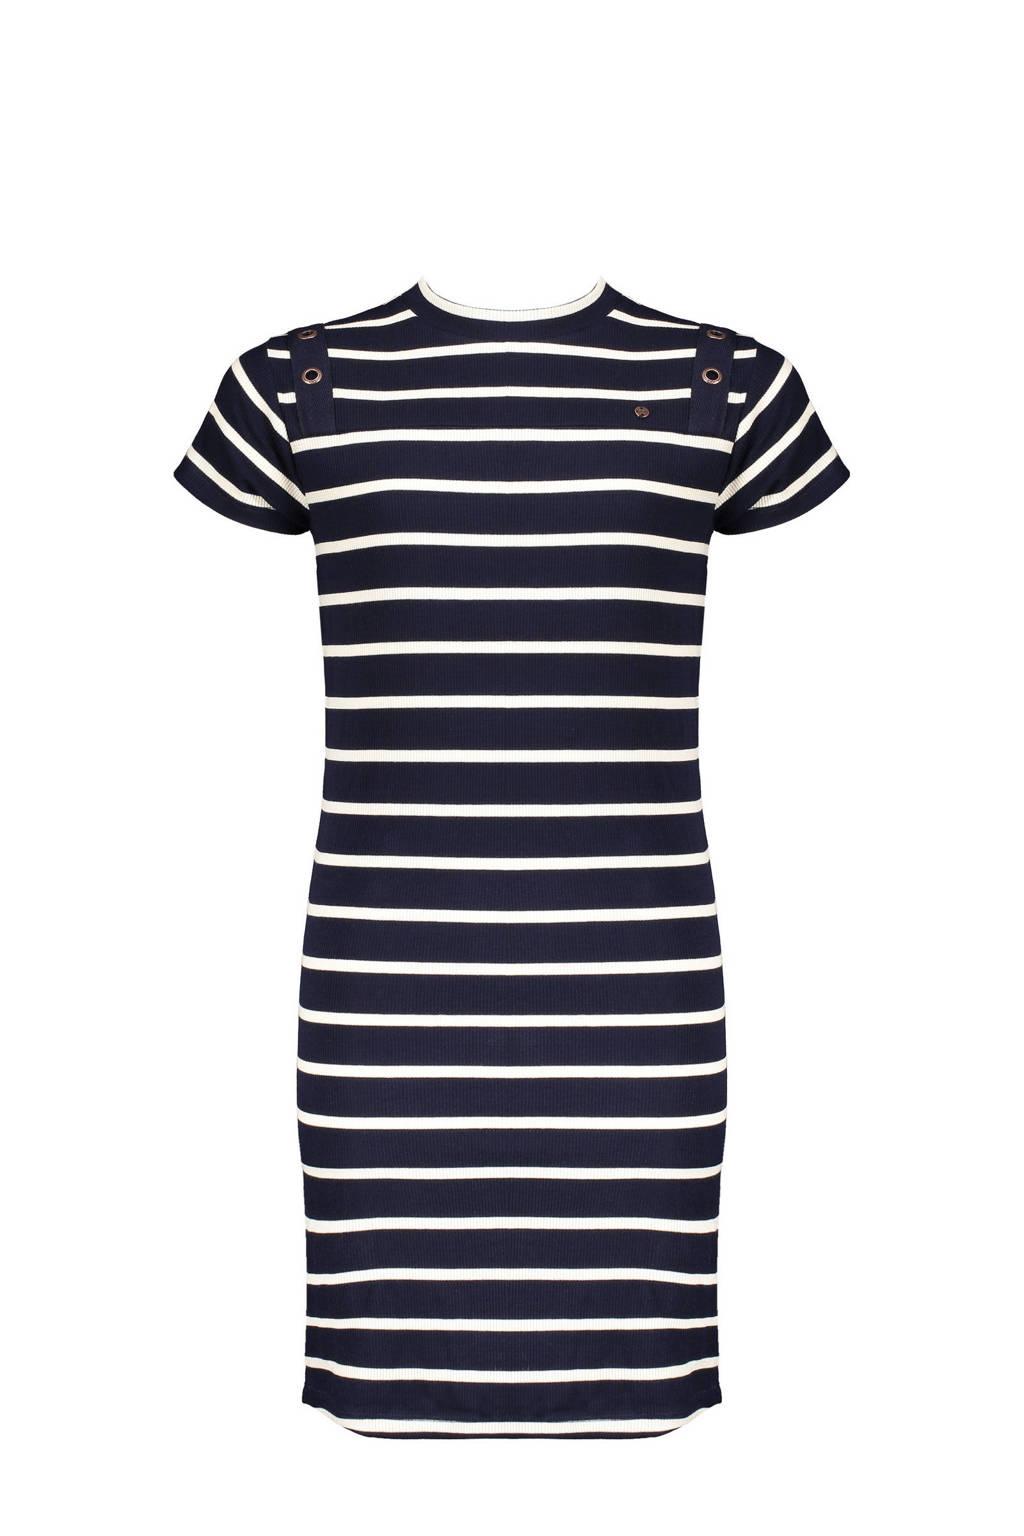 NoBell' gestreepte jurk Mizzyb donkerblauw/wit, Donkerblauw/wit